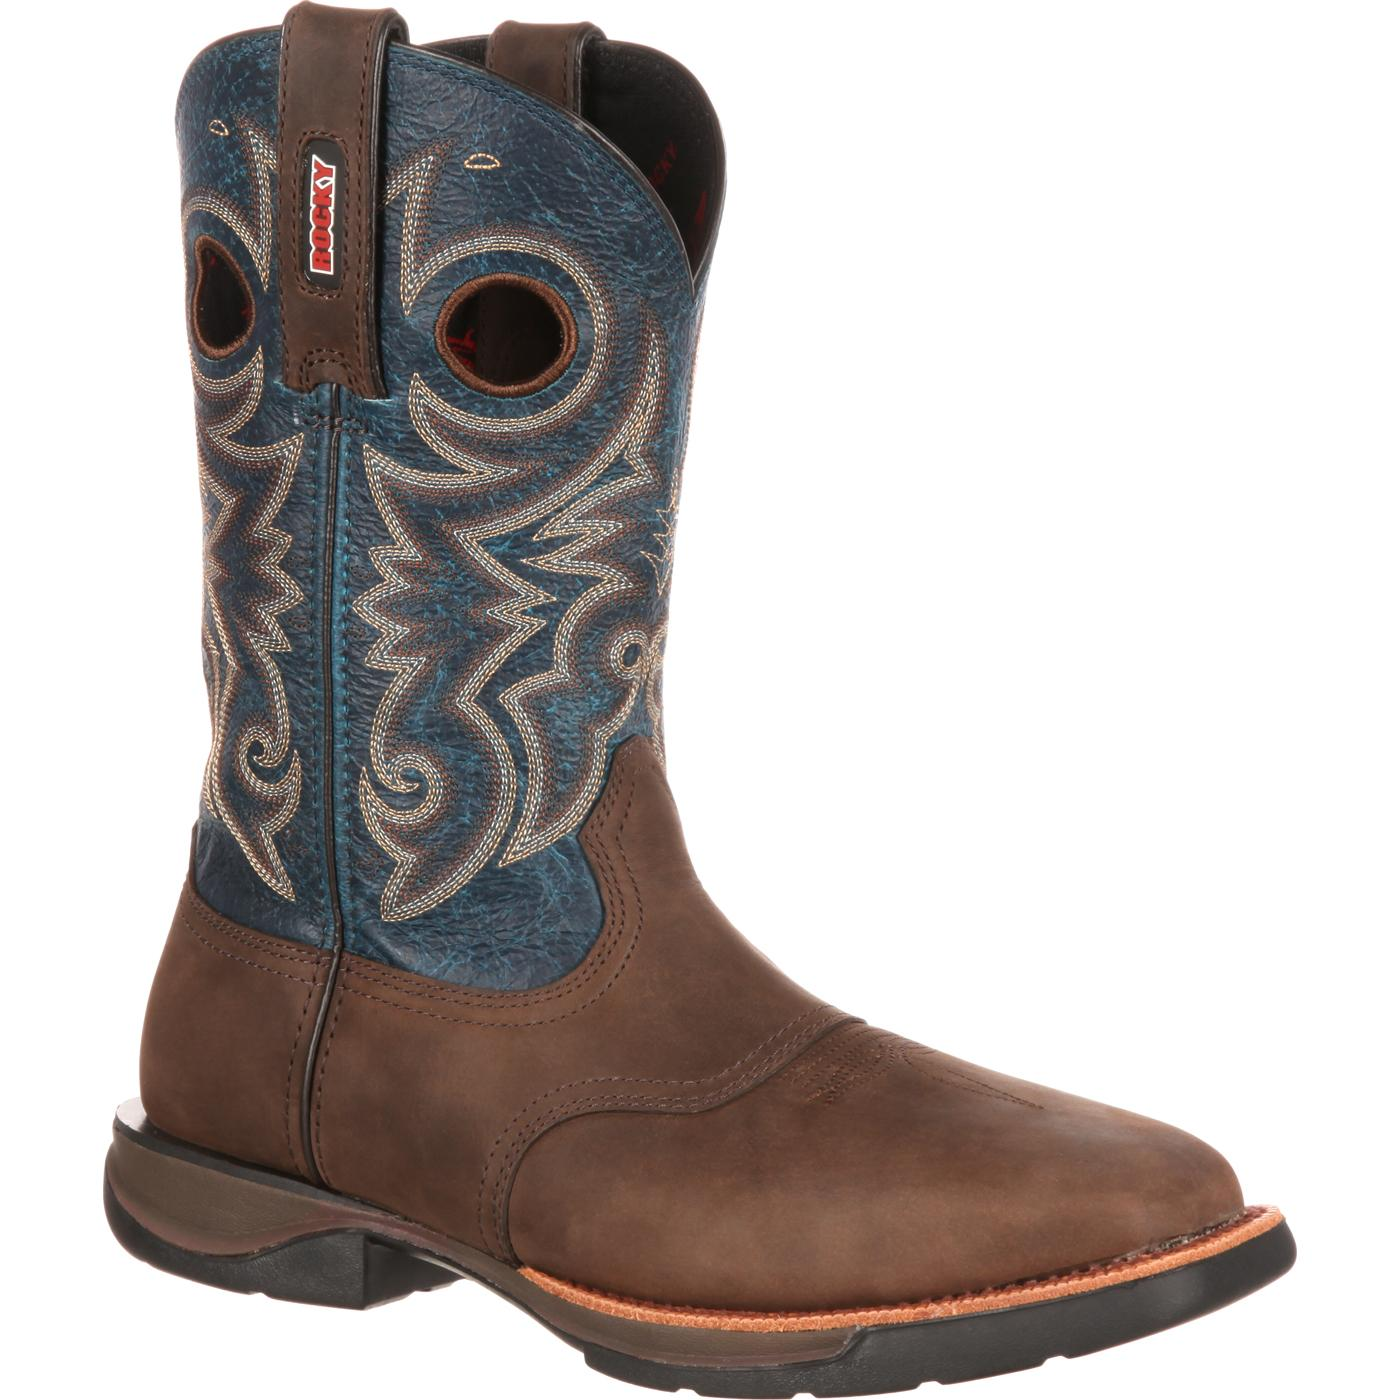 Rocky LT: Men's Steel Toe Blue Brown Saddle Western Boot